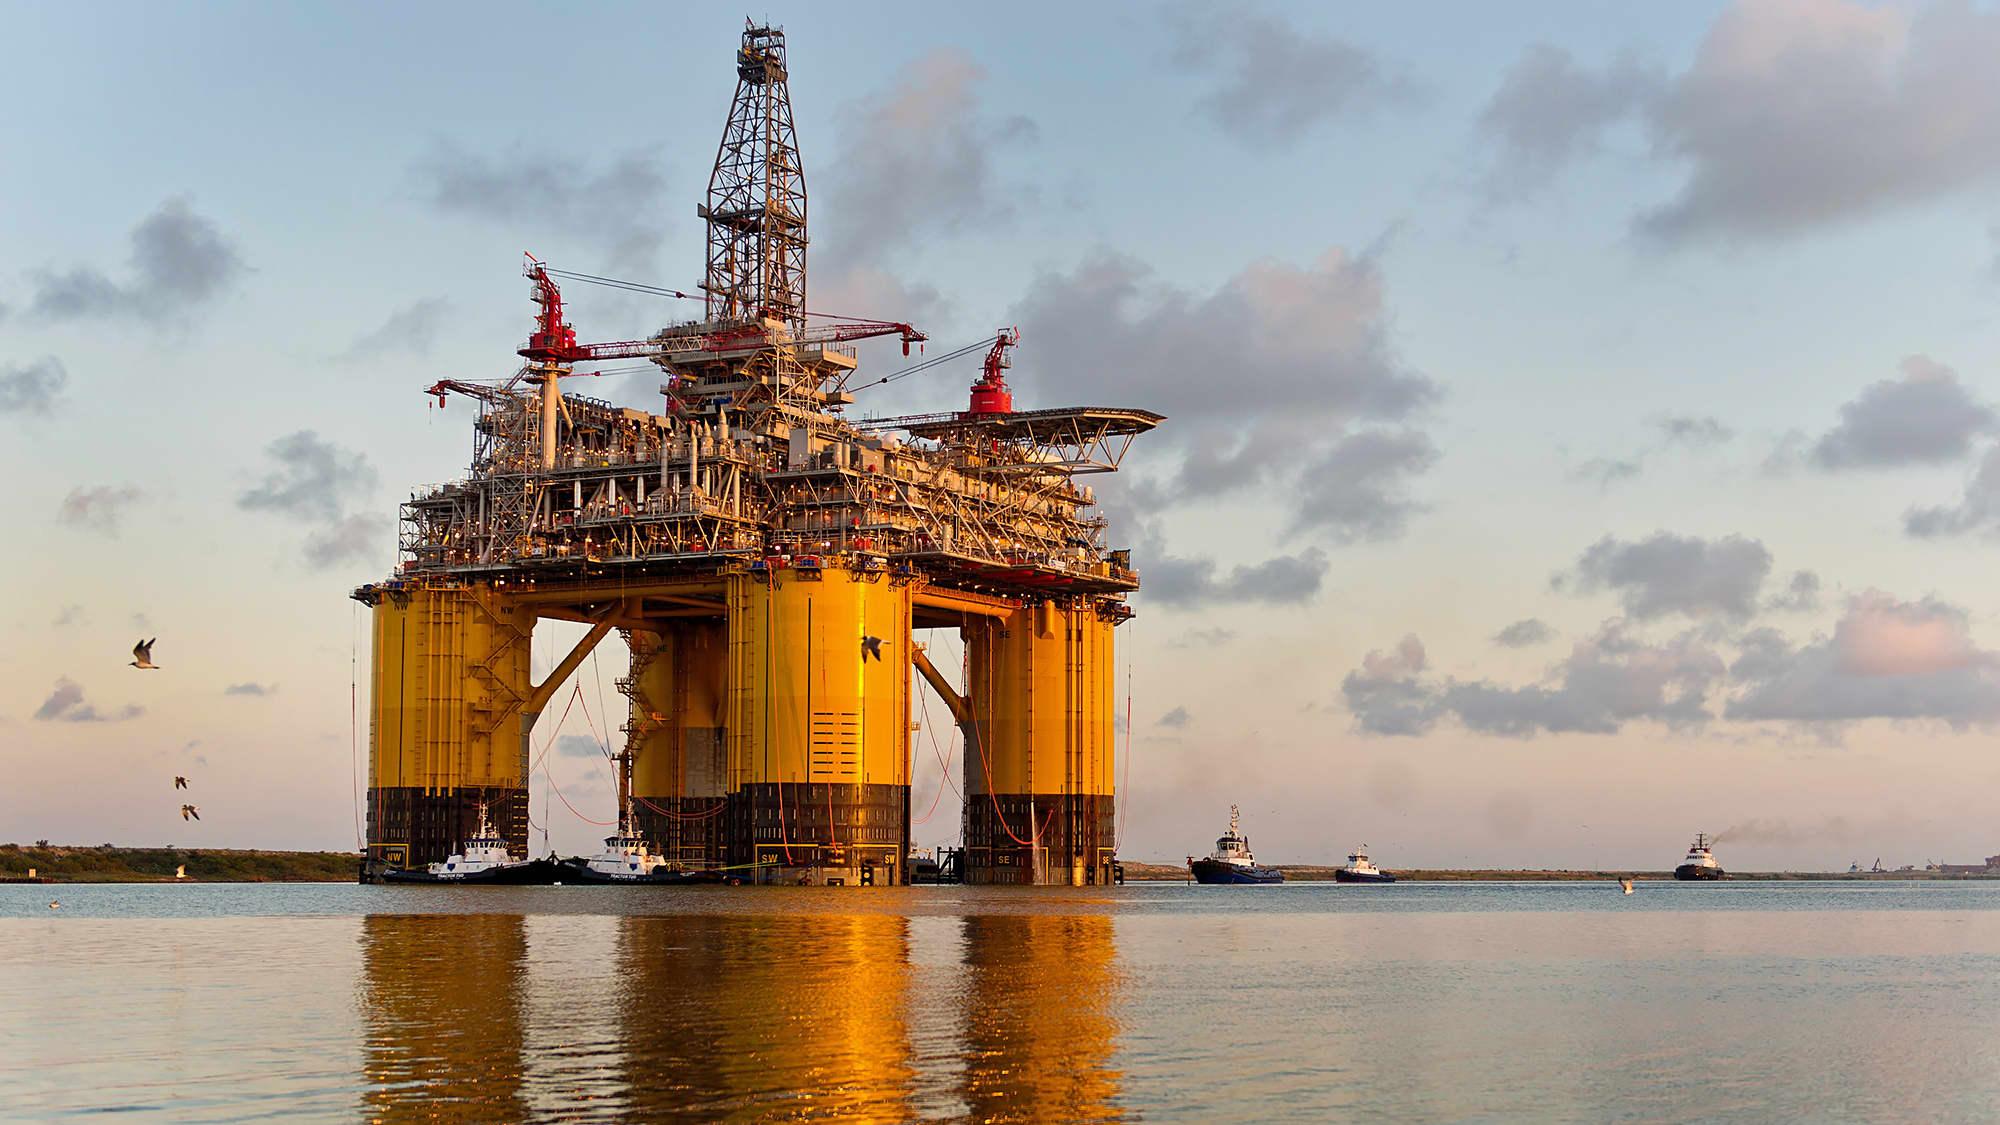 A Royal Dutch Shell platform